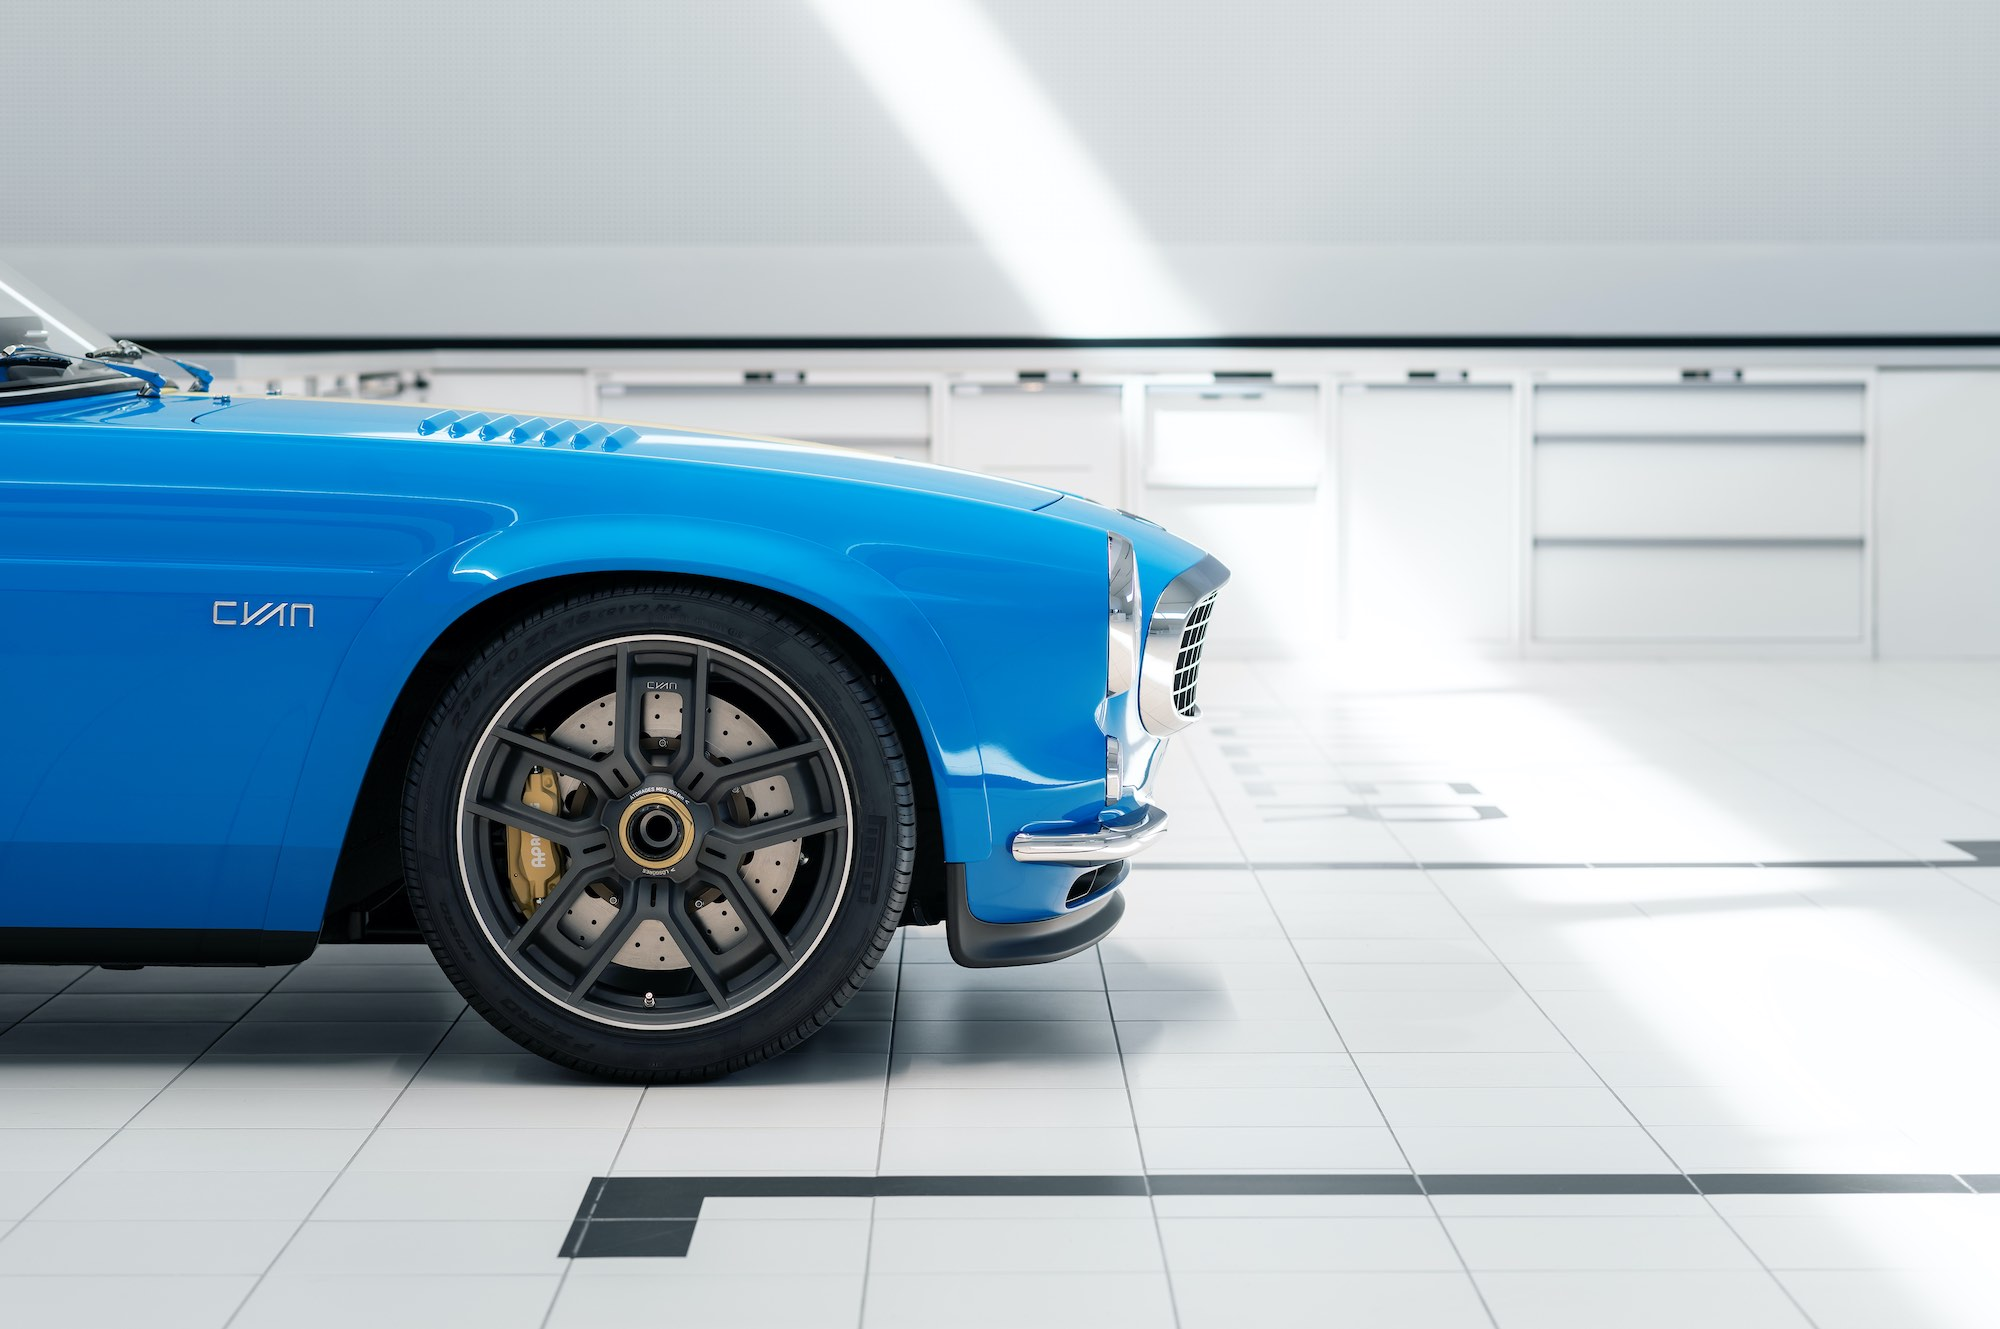 The Petrolhead Corner - Restomod Volvo P1800 Cyan